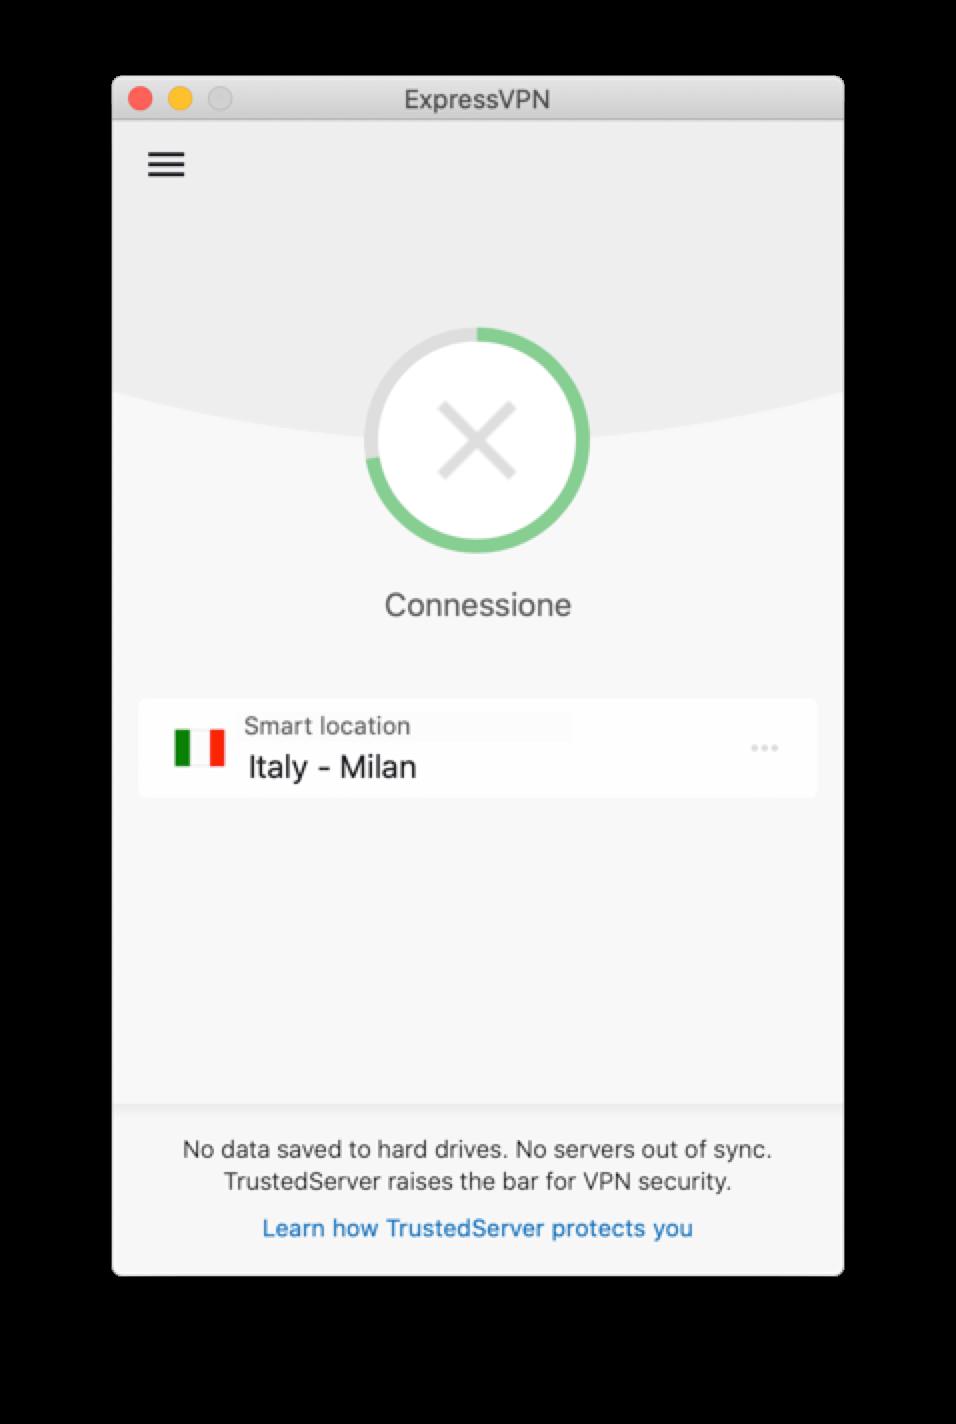 L'app di ExpressVPN si blocca mentre prova a connettersi.